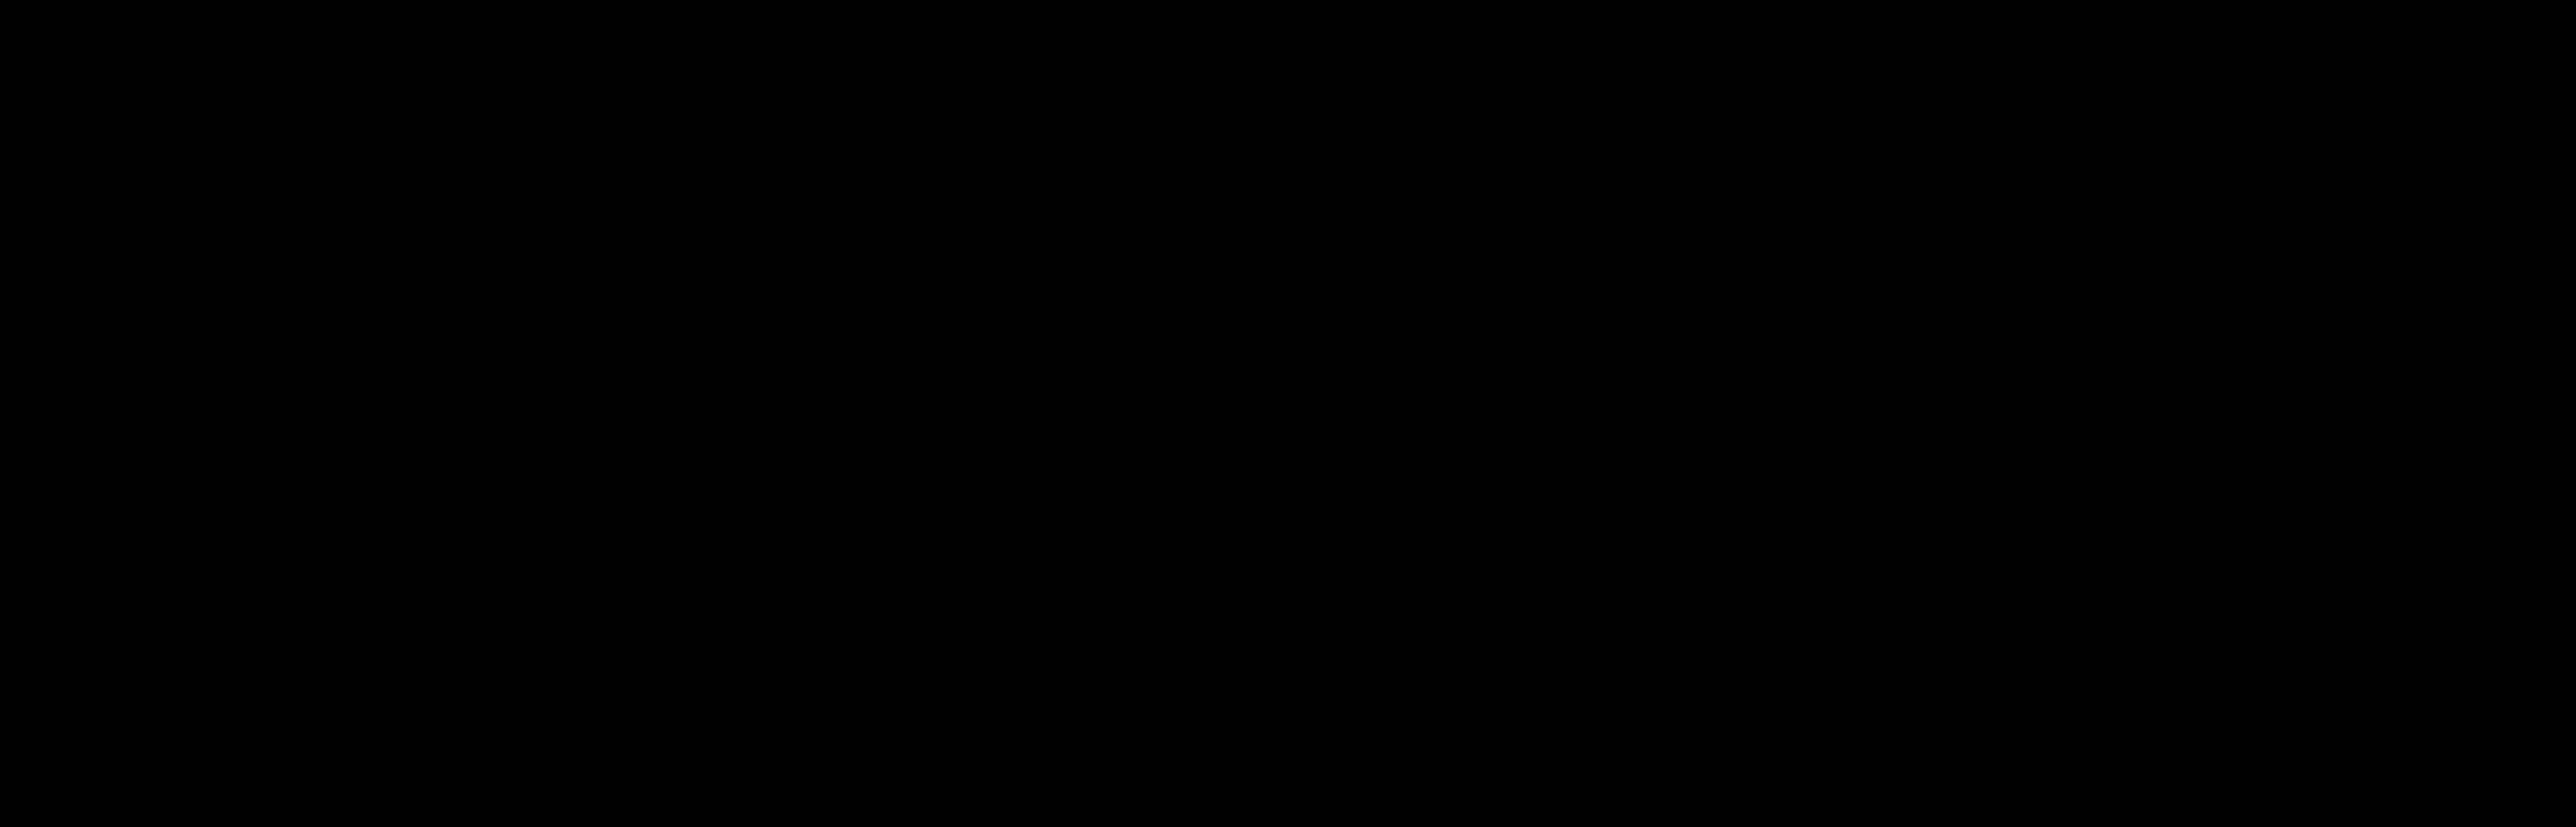 Lightspace's logo